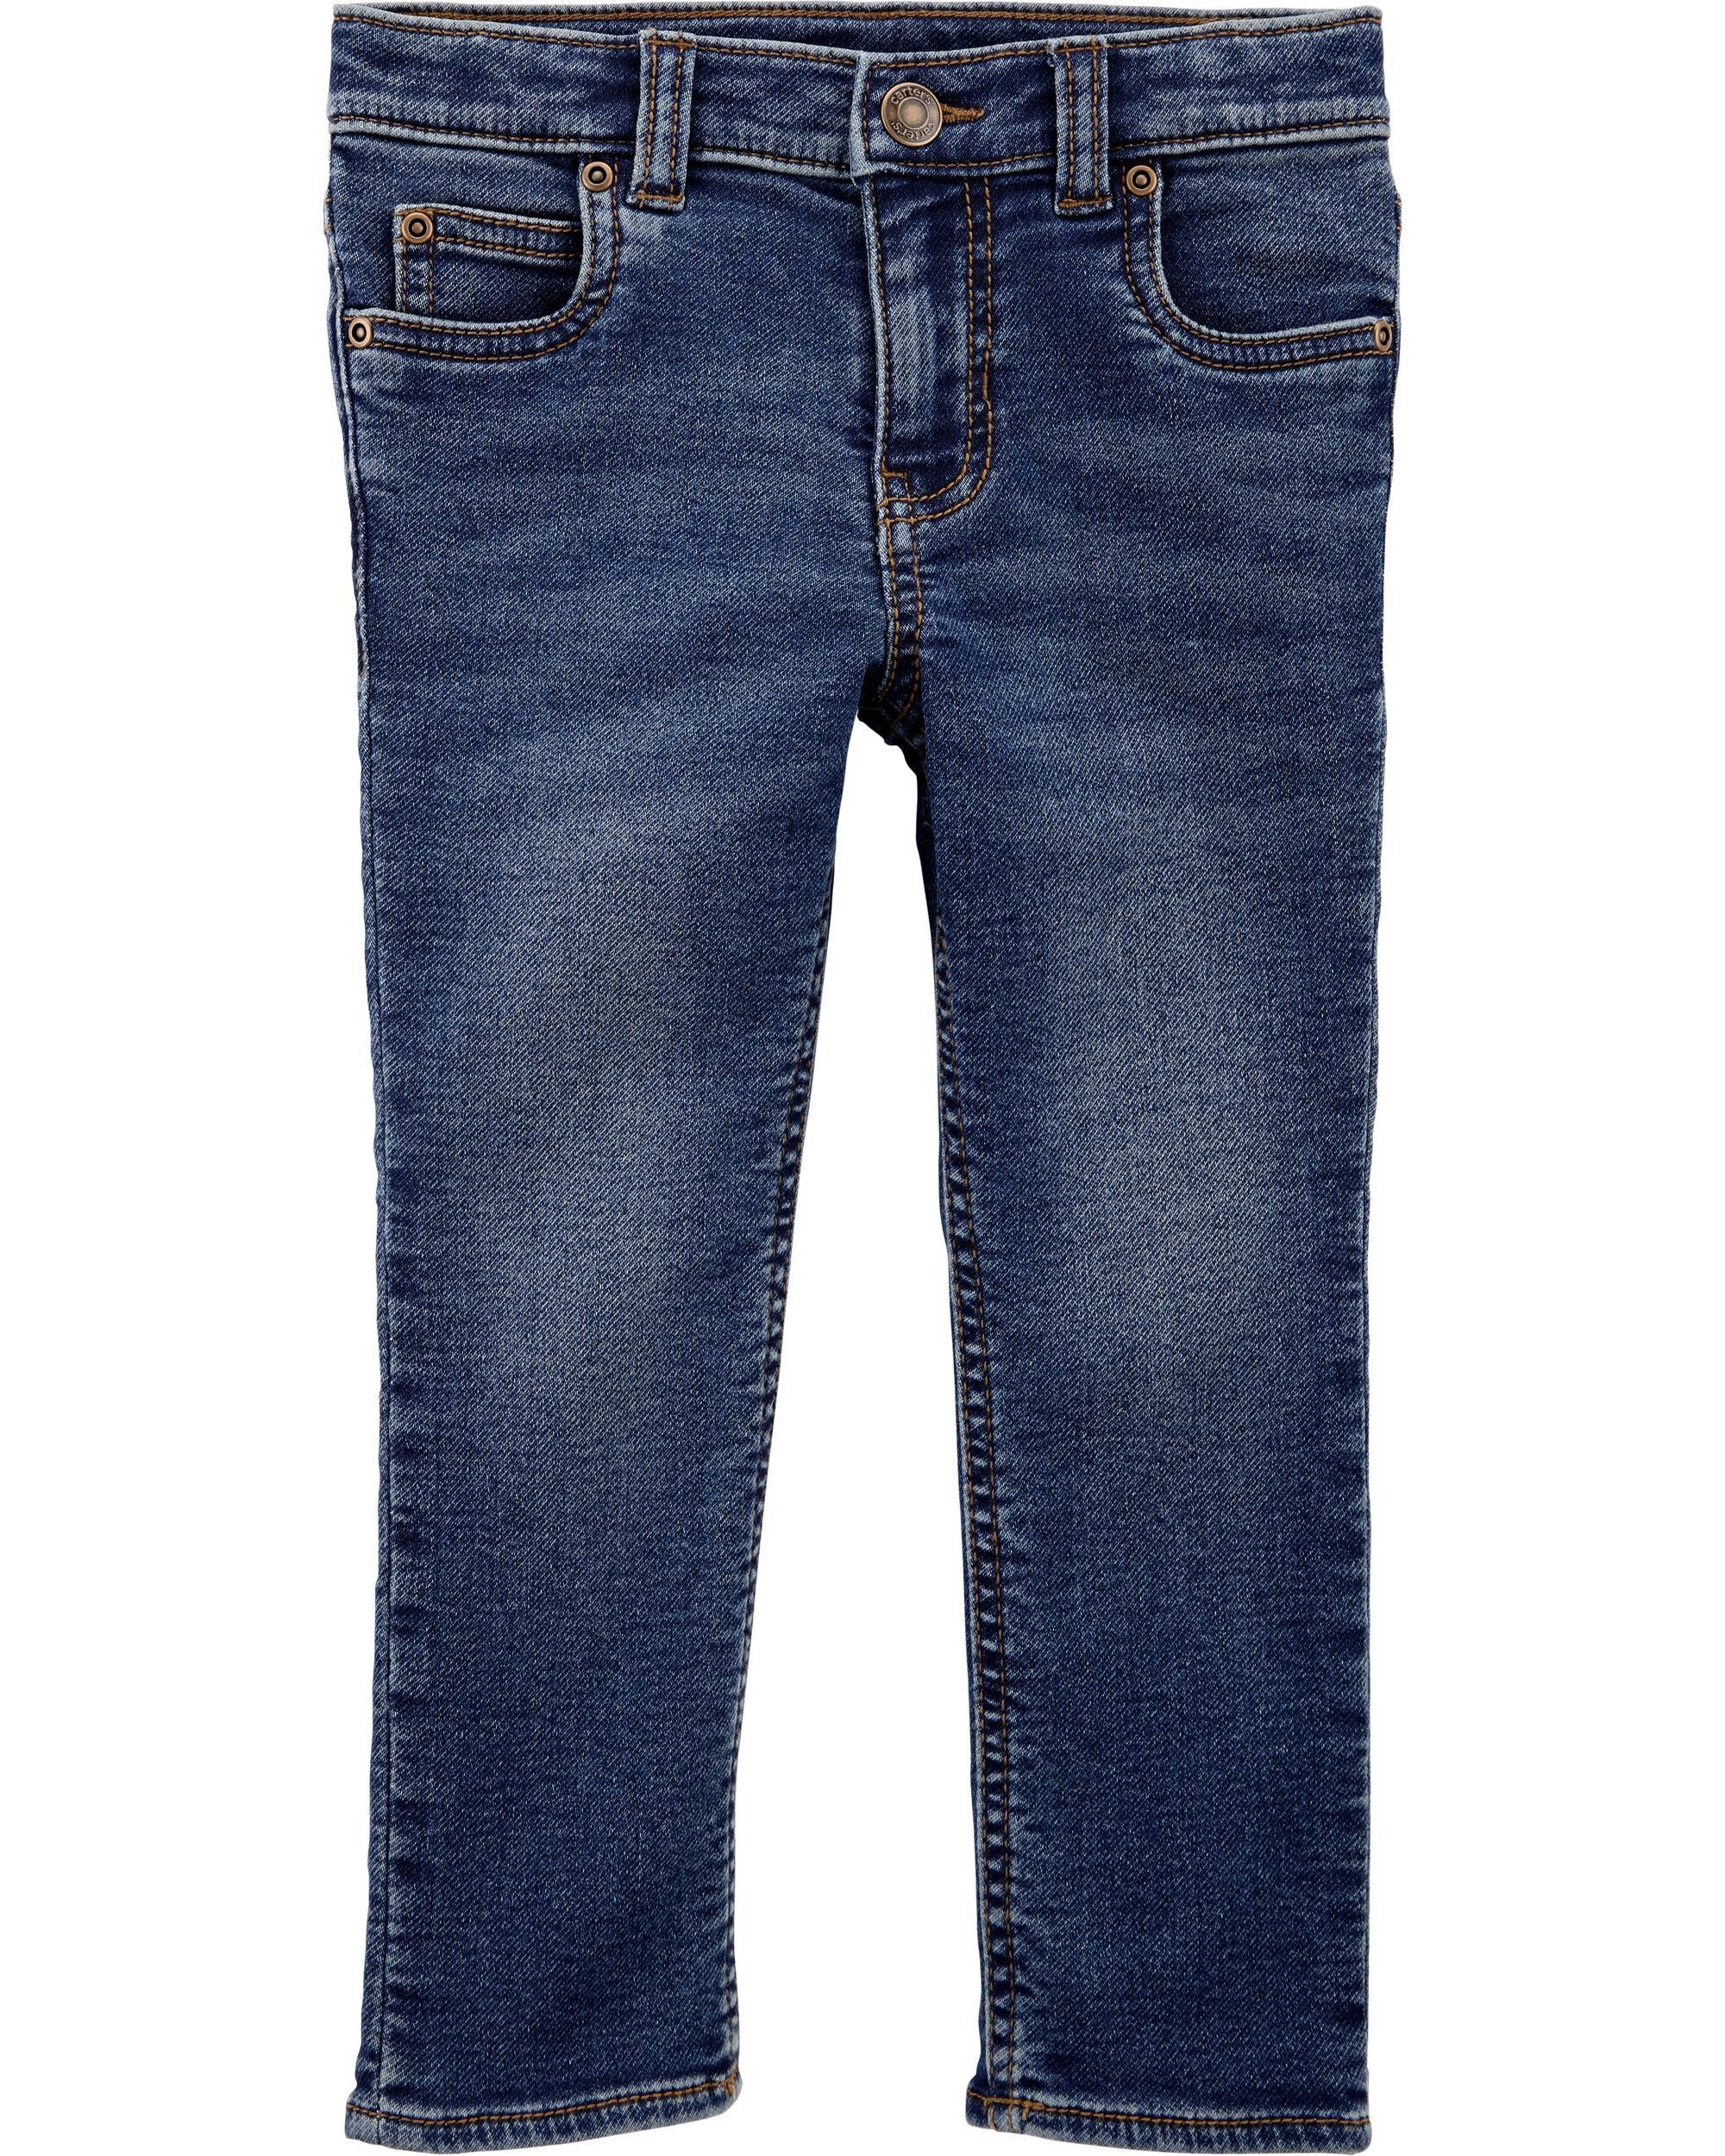 *CLEARANCE* 5-Pocket Skinny Jeans